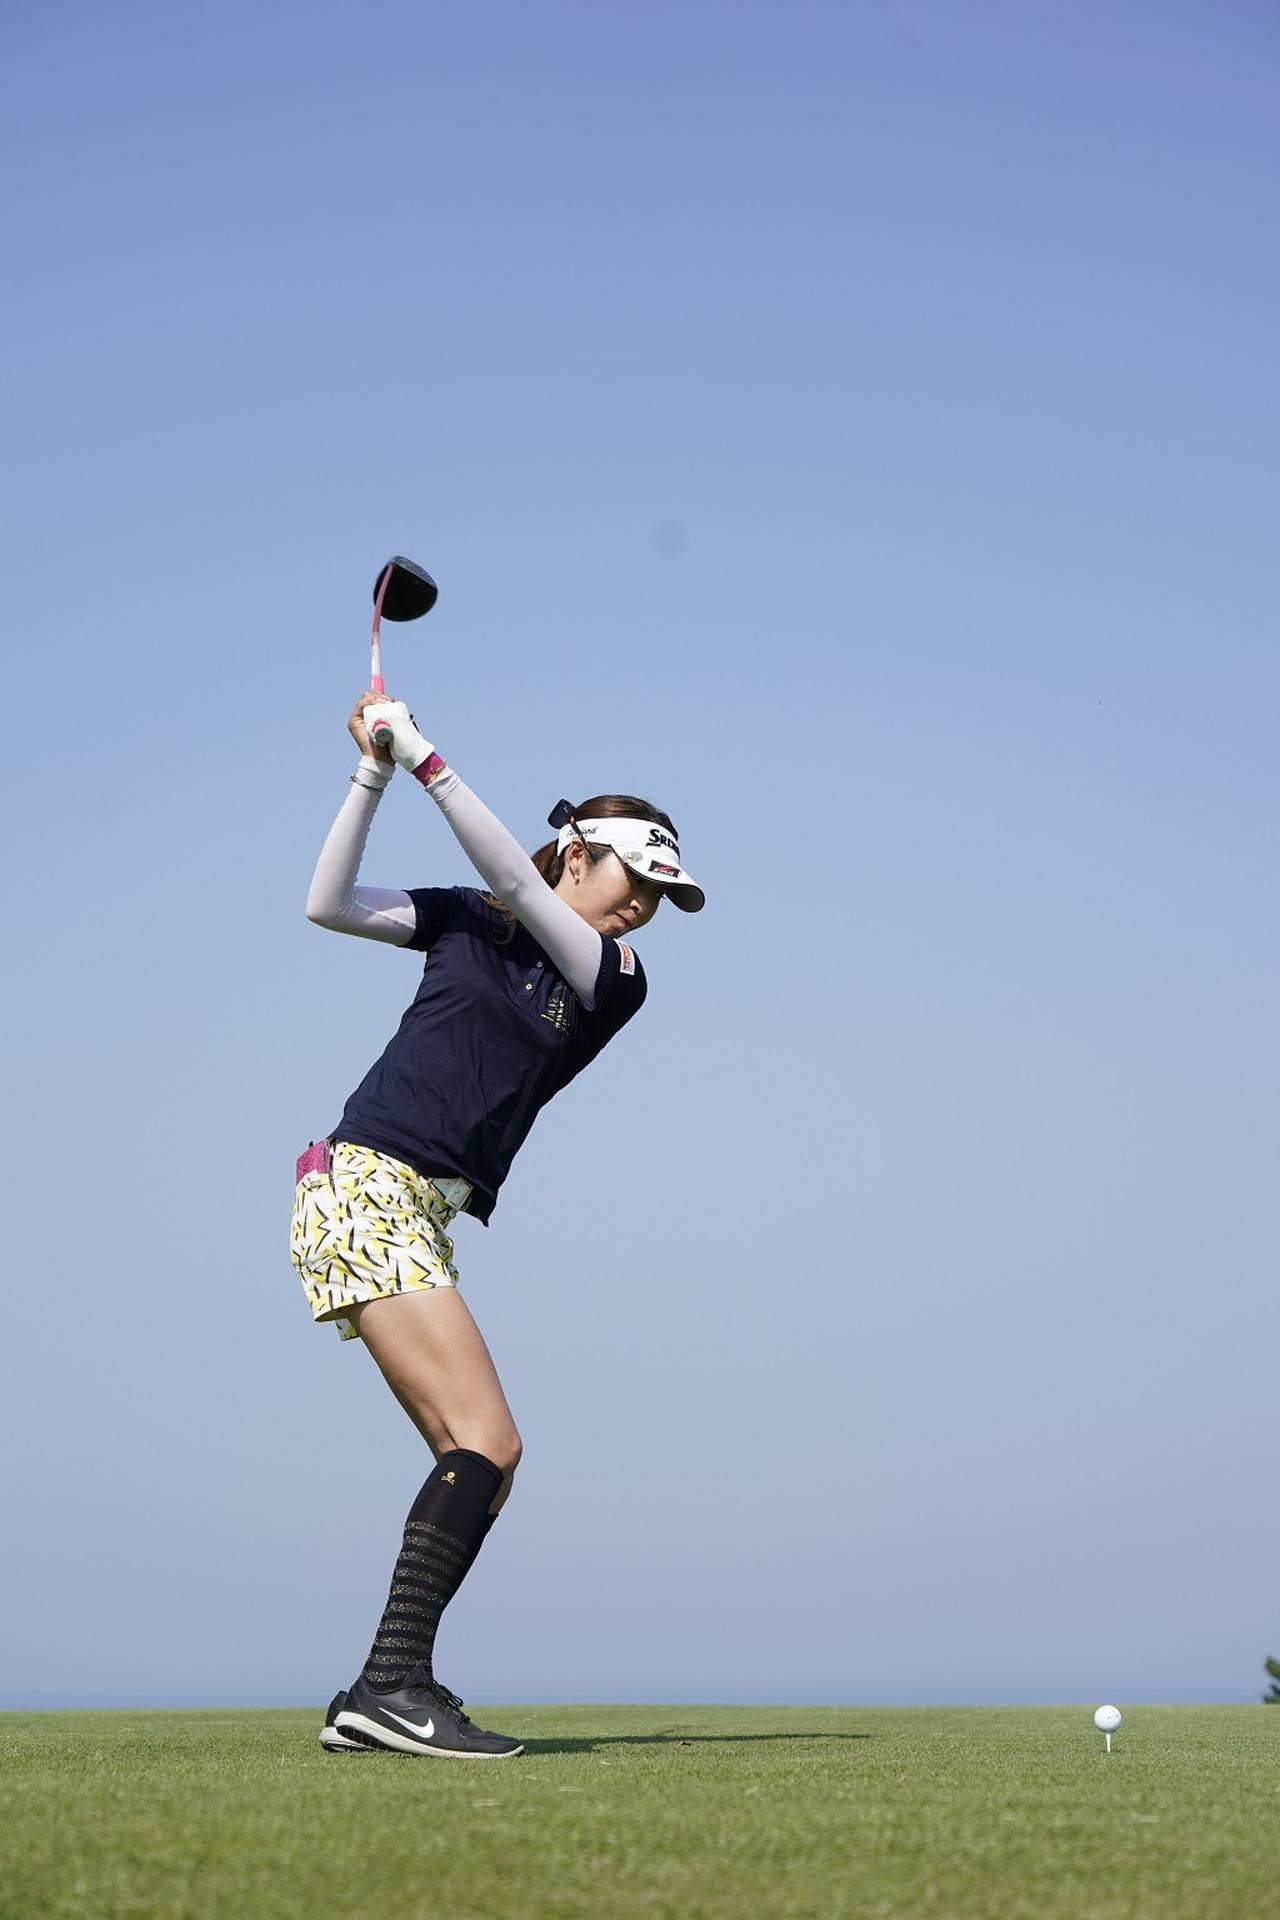 Images : 6番目の画像 - 金田久美子ドライバー後方連続写真 - みんなのゴルフダイジェスト